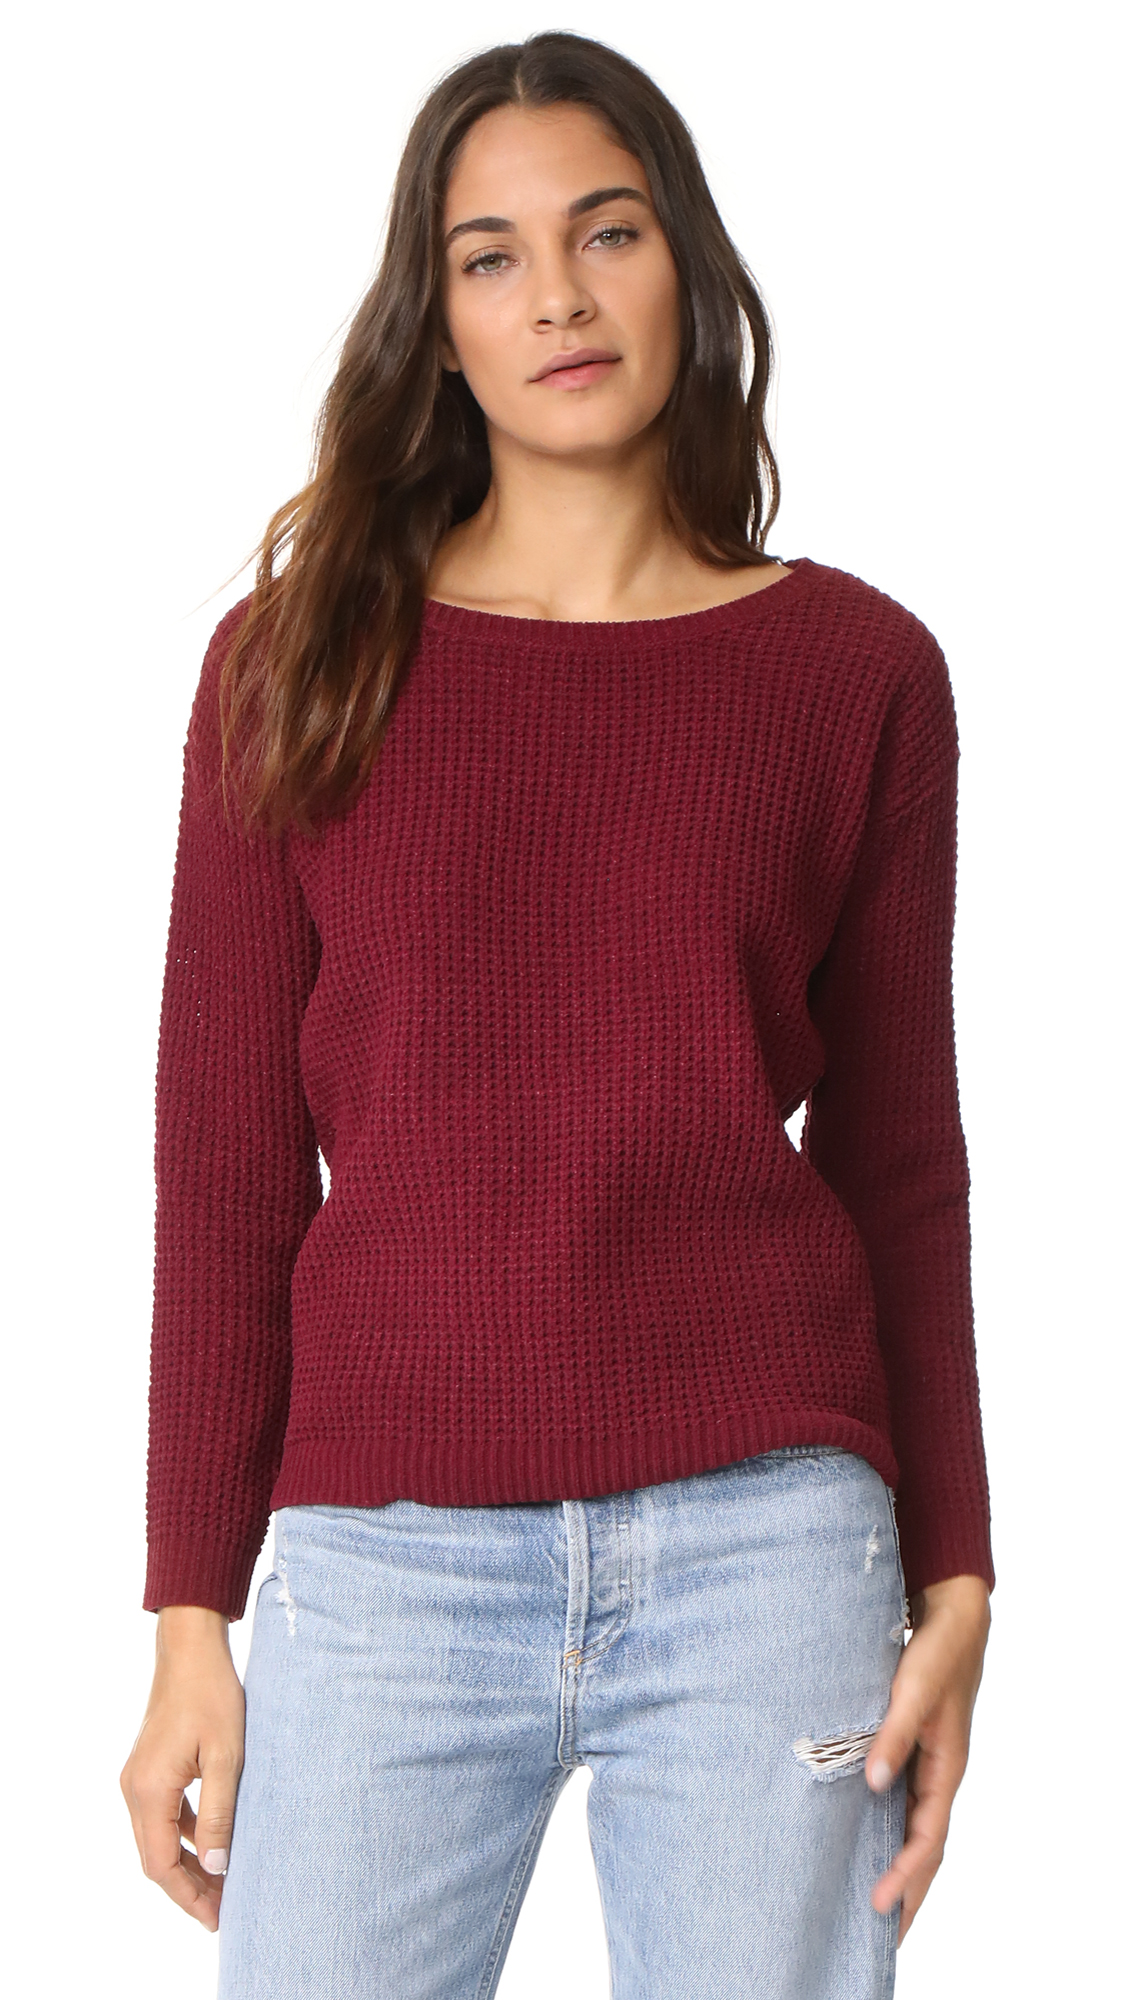 BB Dakota Eugene Sweater - Bordeaux